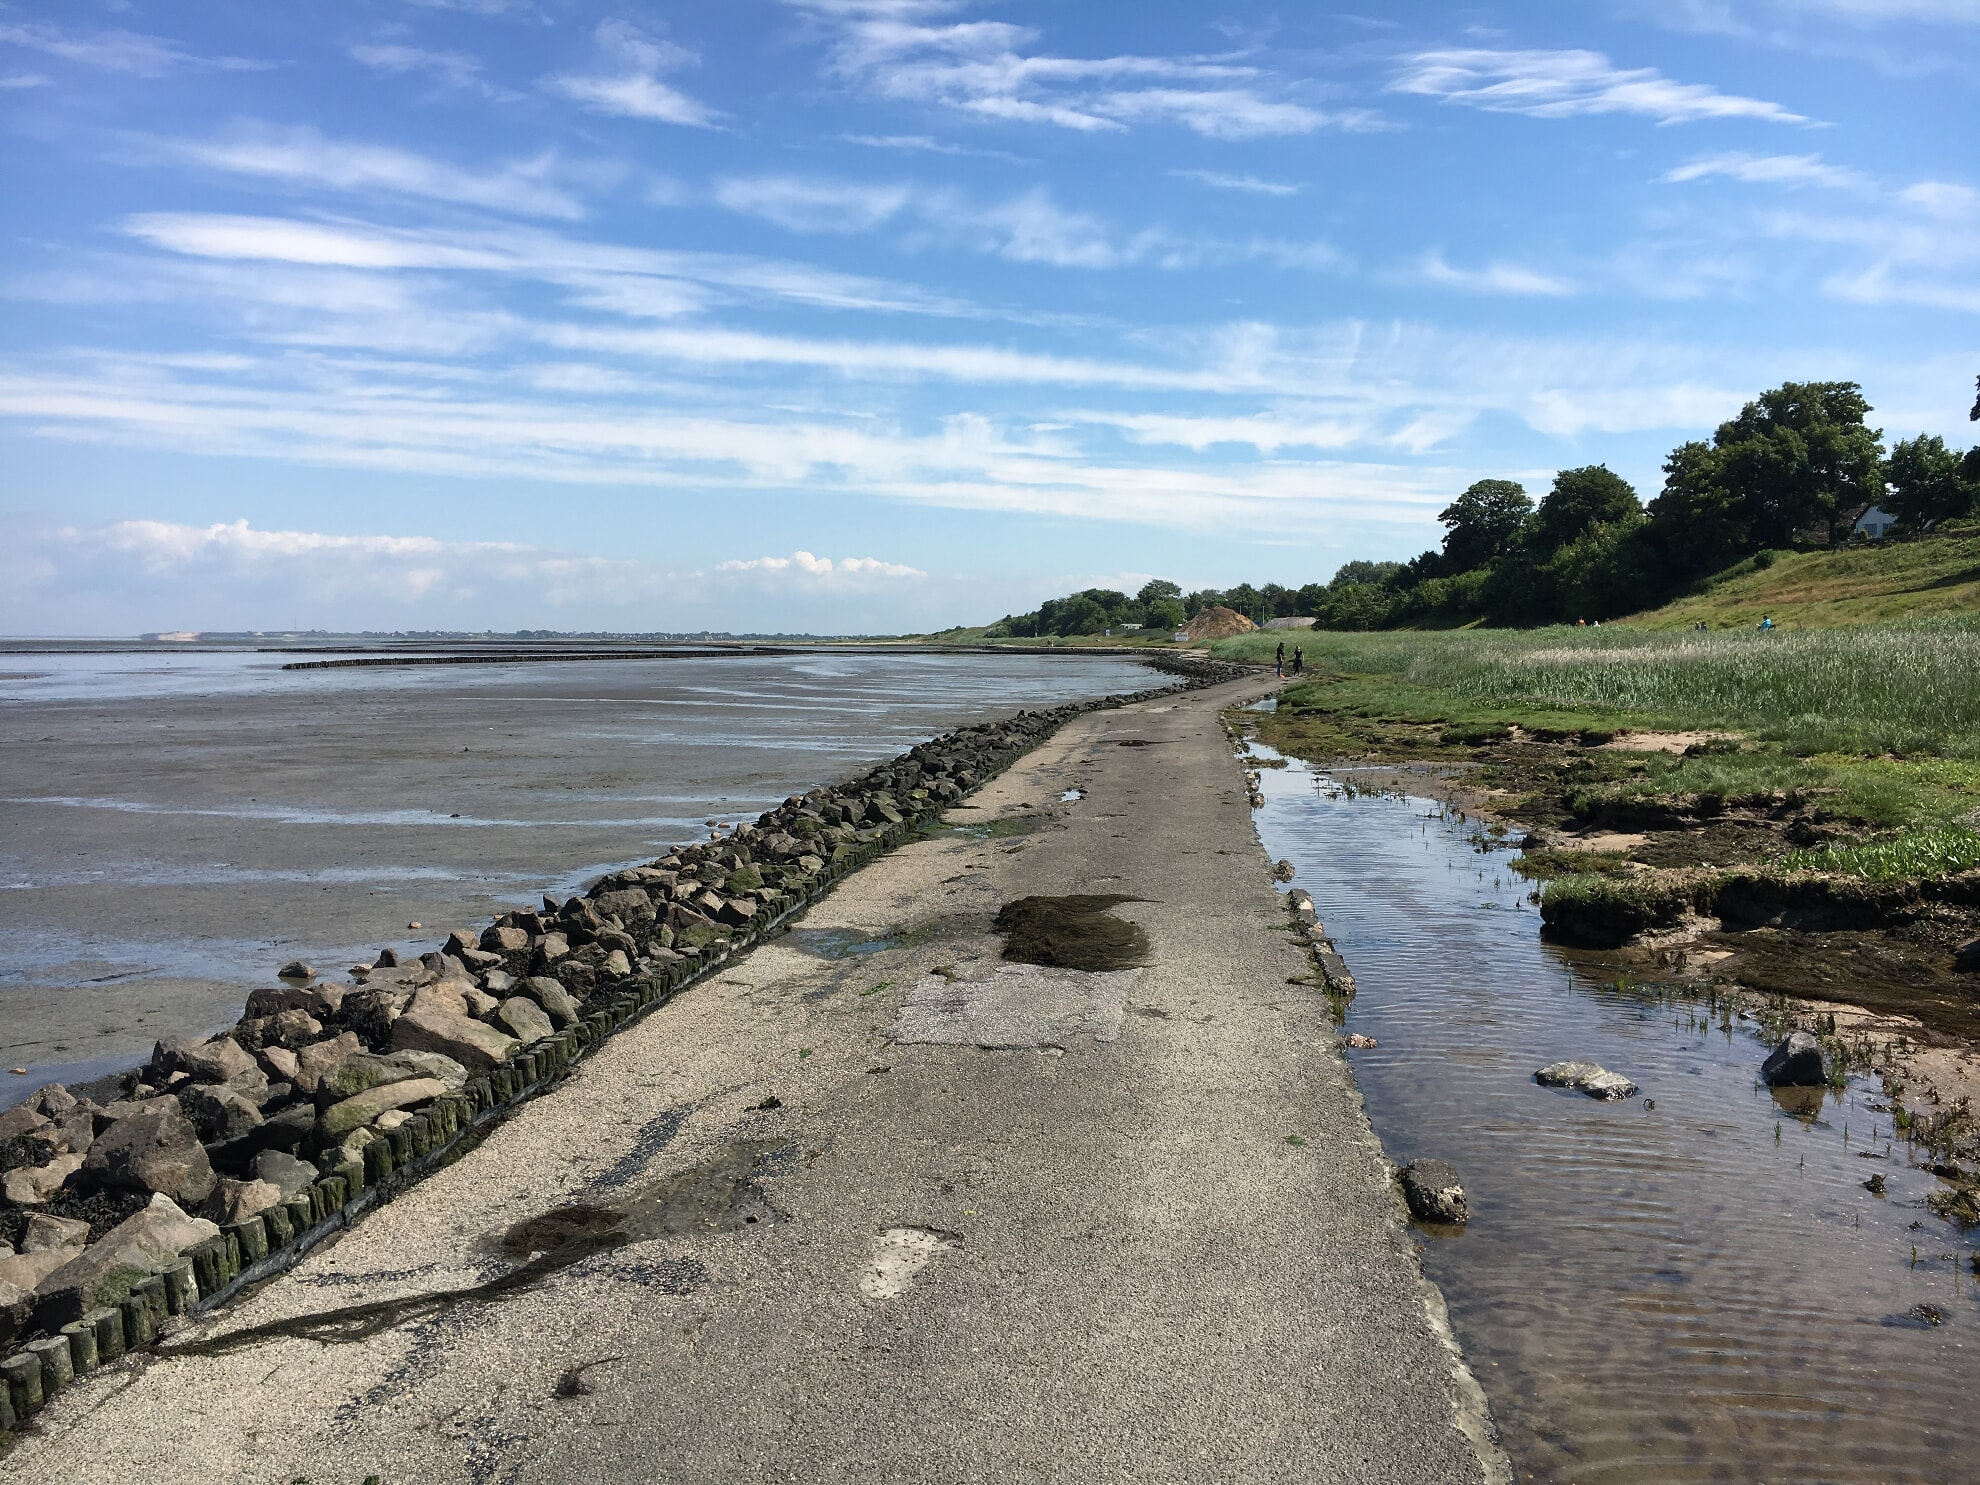 asphaltierter Weg am Keitumer Wattenmeer